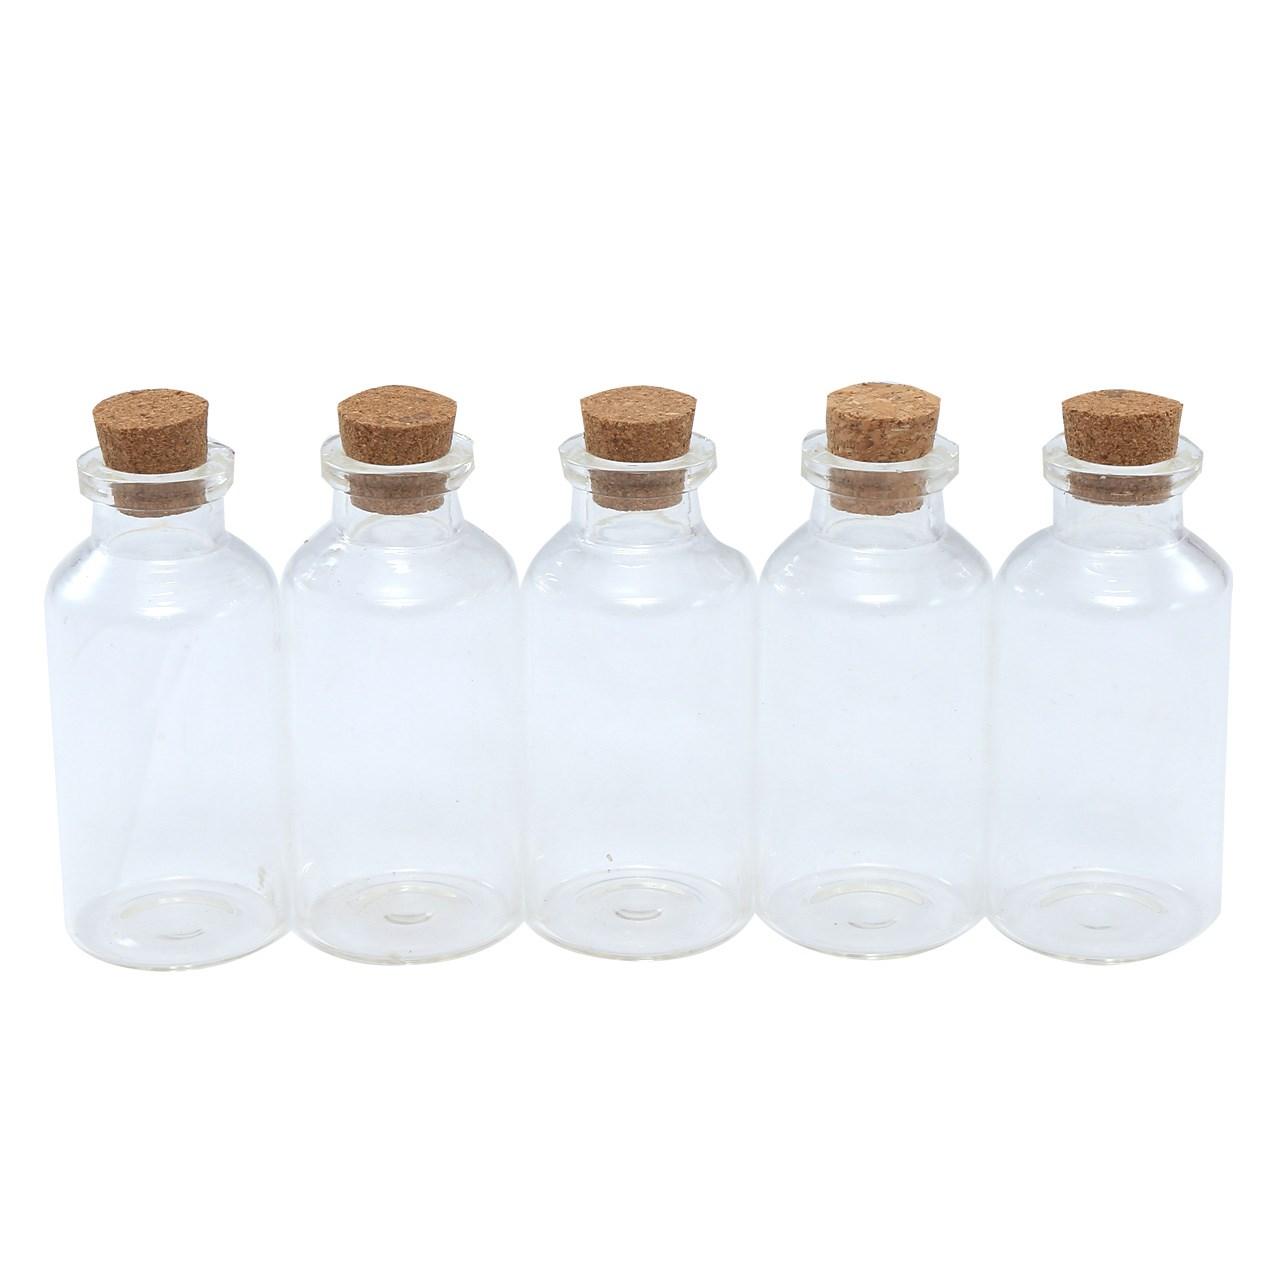 بطری دکوری کوه شاپ کد TP-C4466 بسته 5 عددی